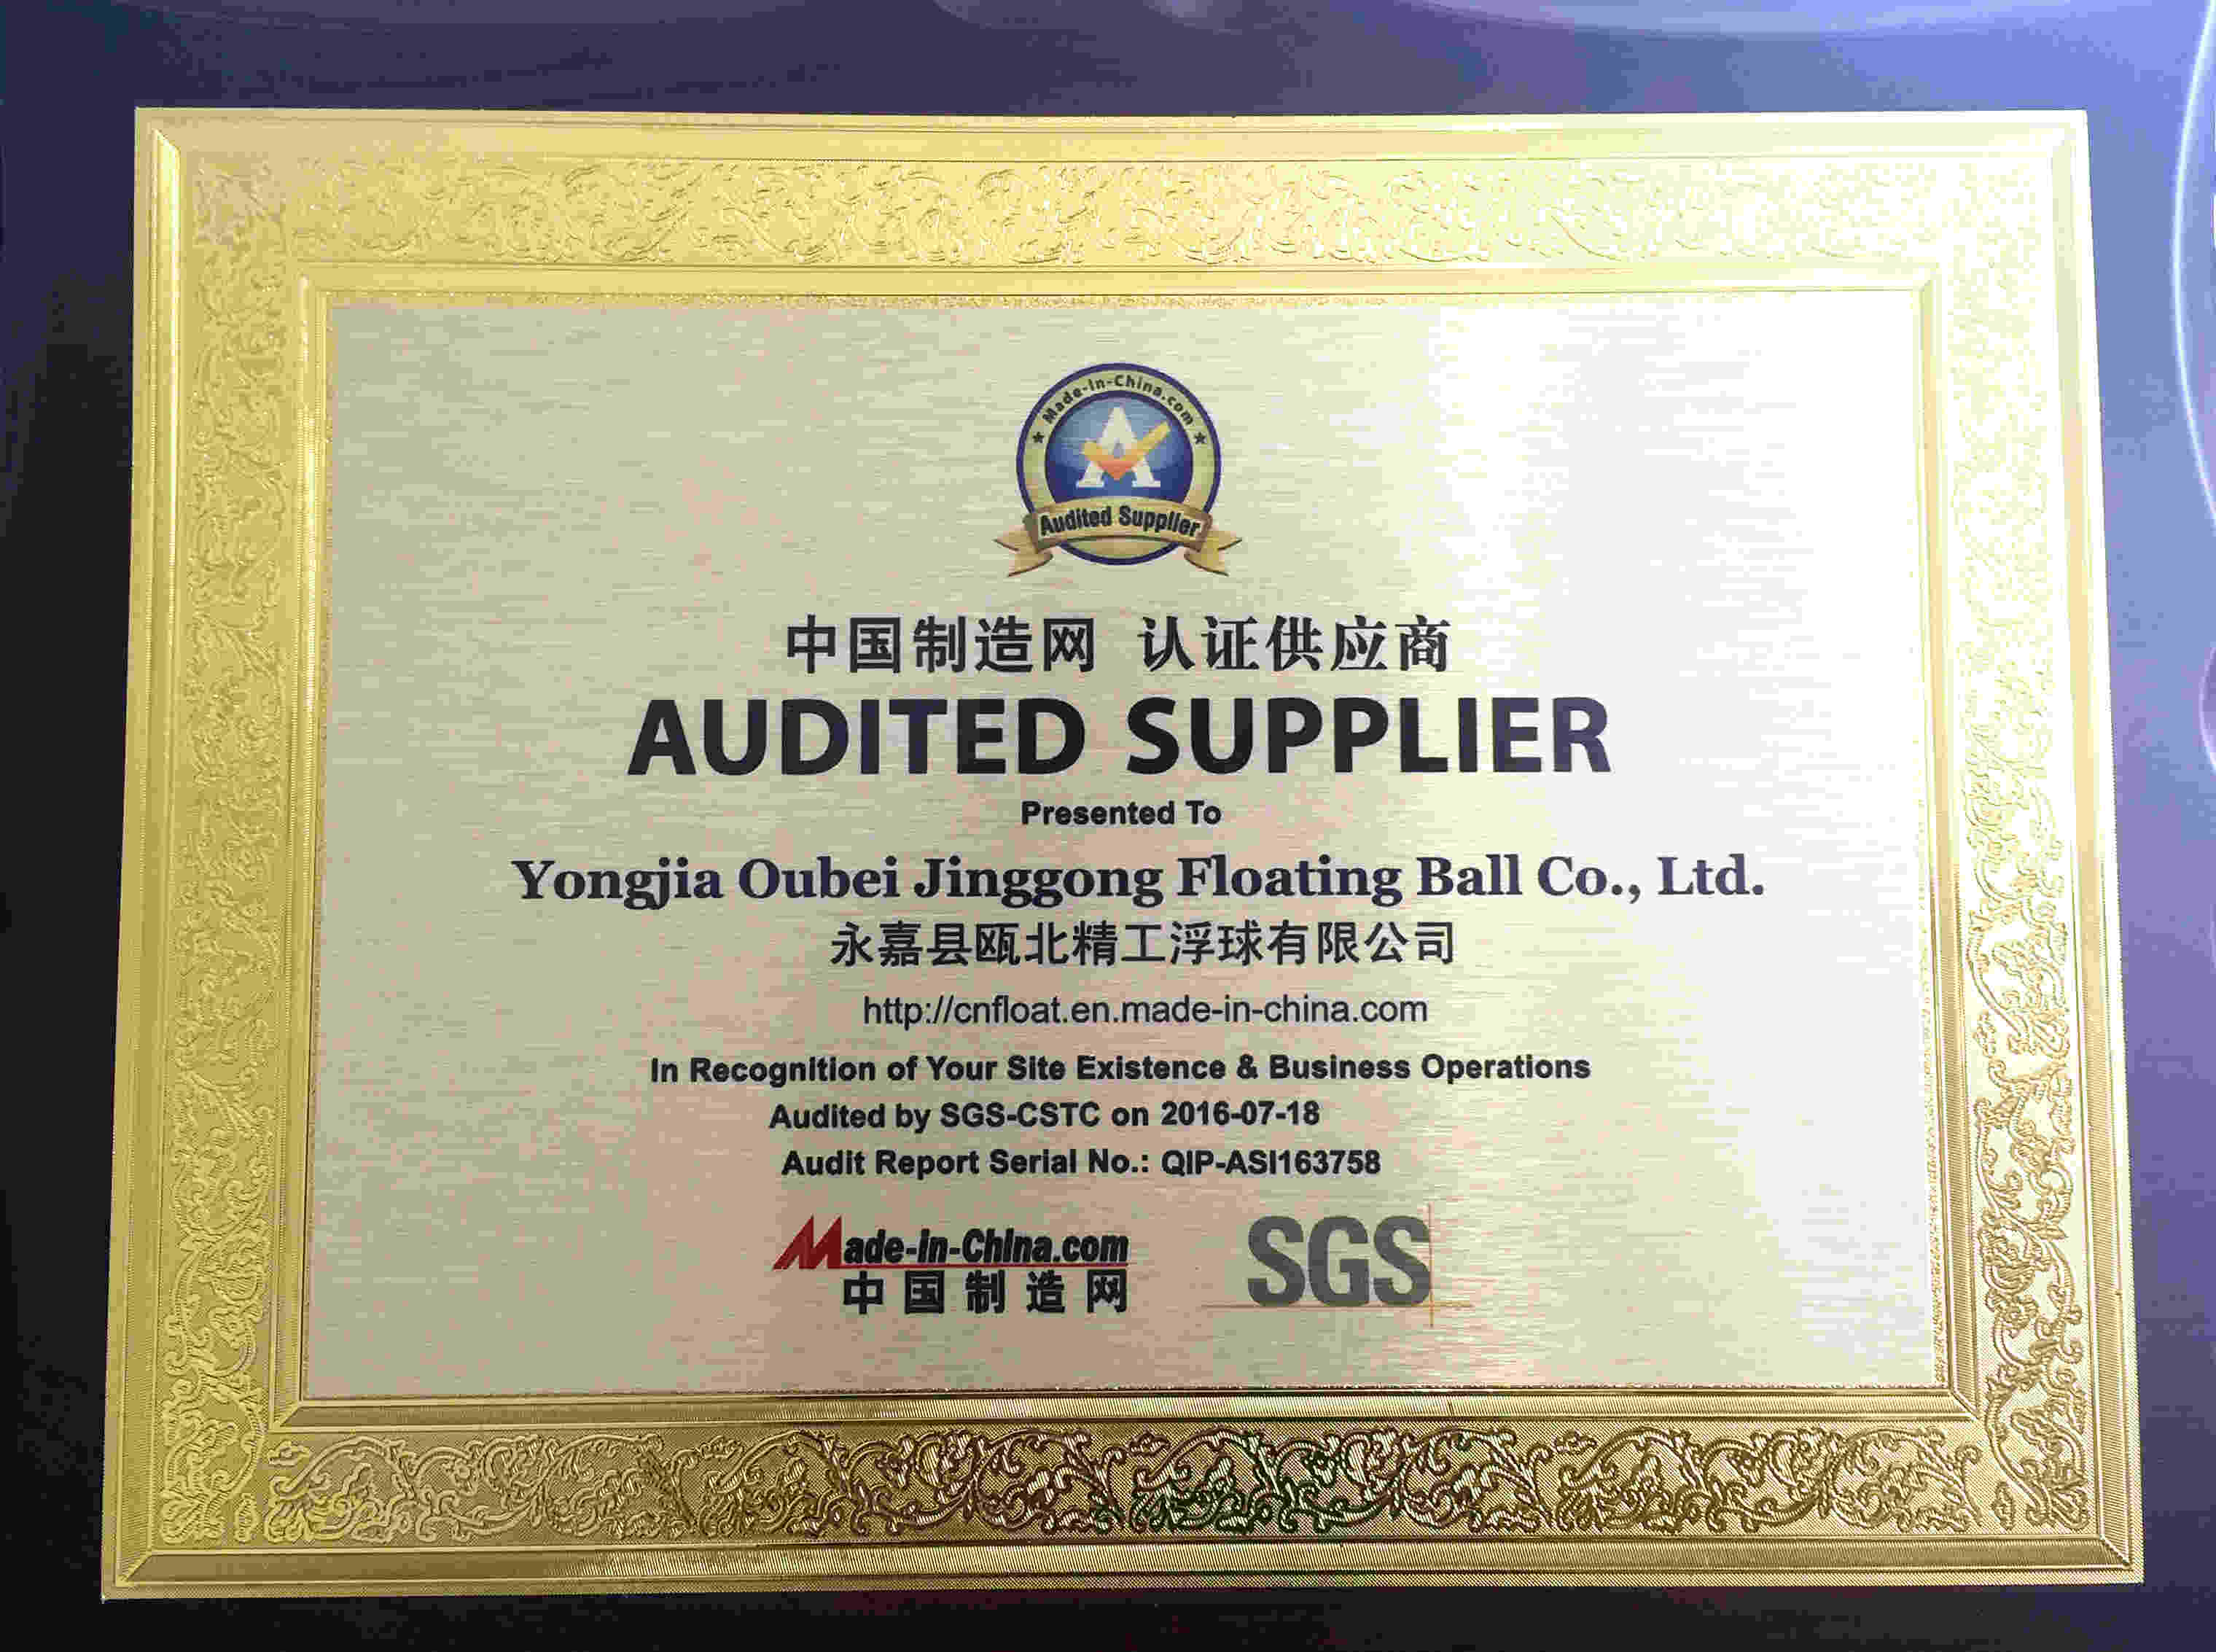 SGS Certification Medal